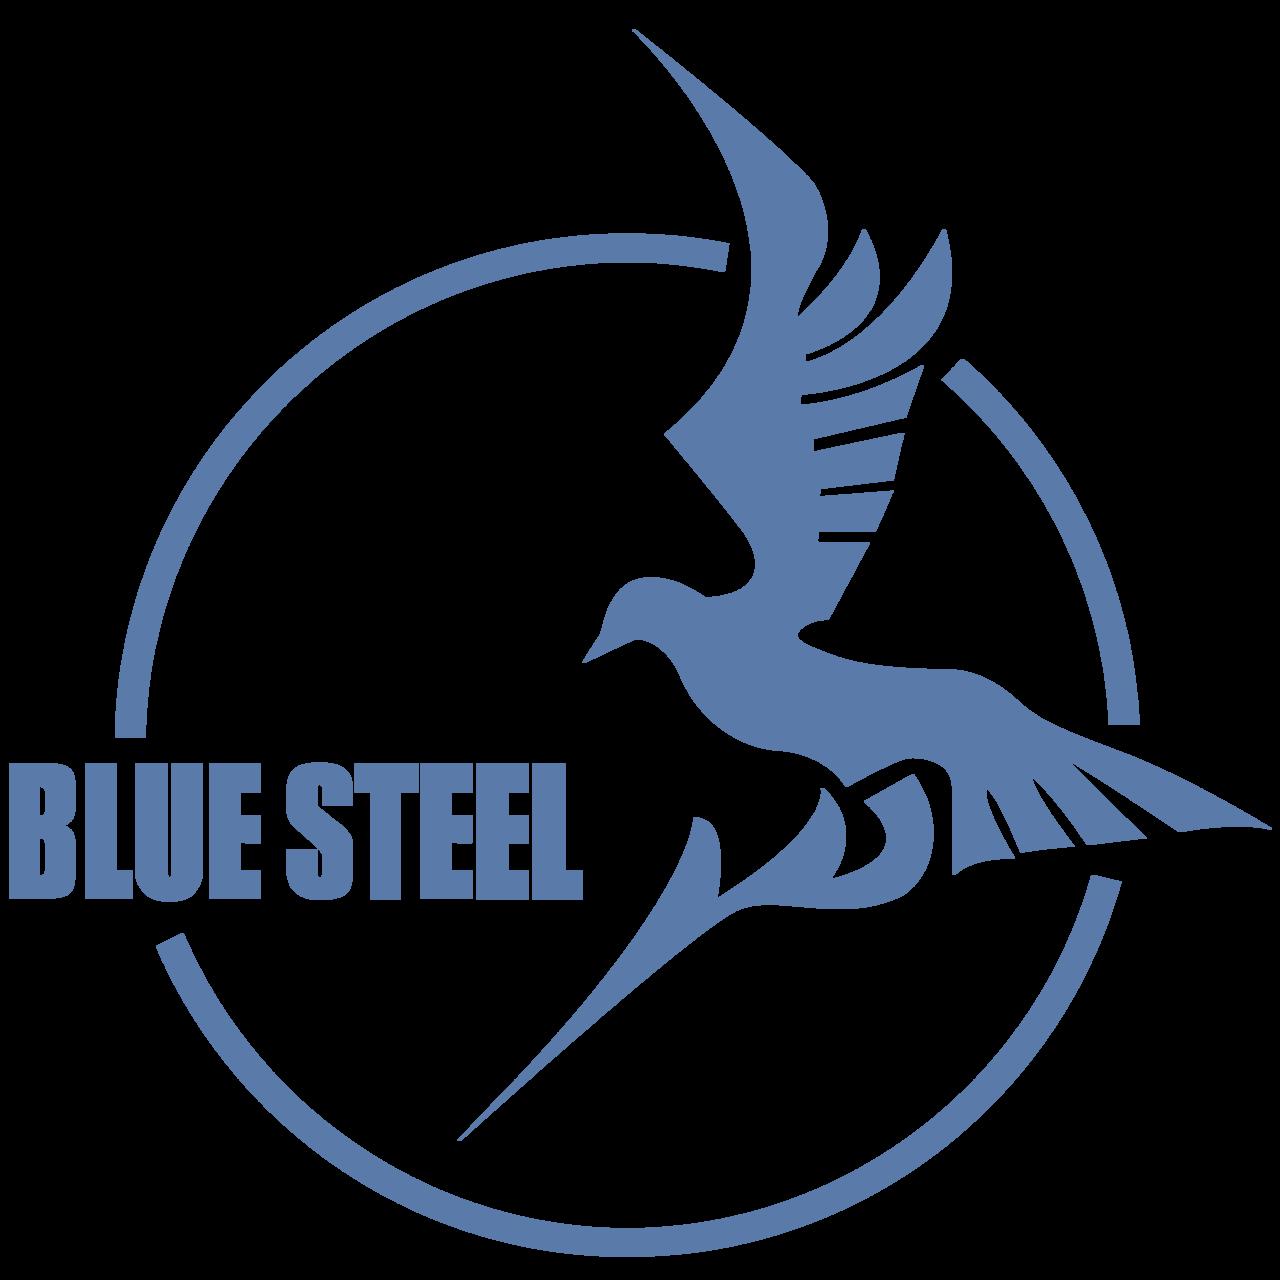 bluesteellogo.png